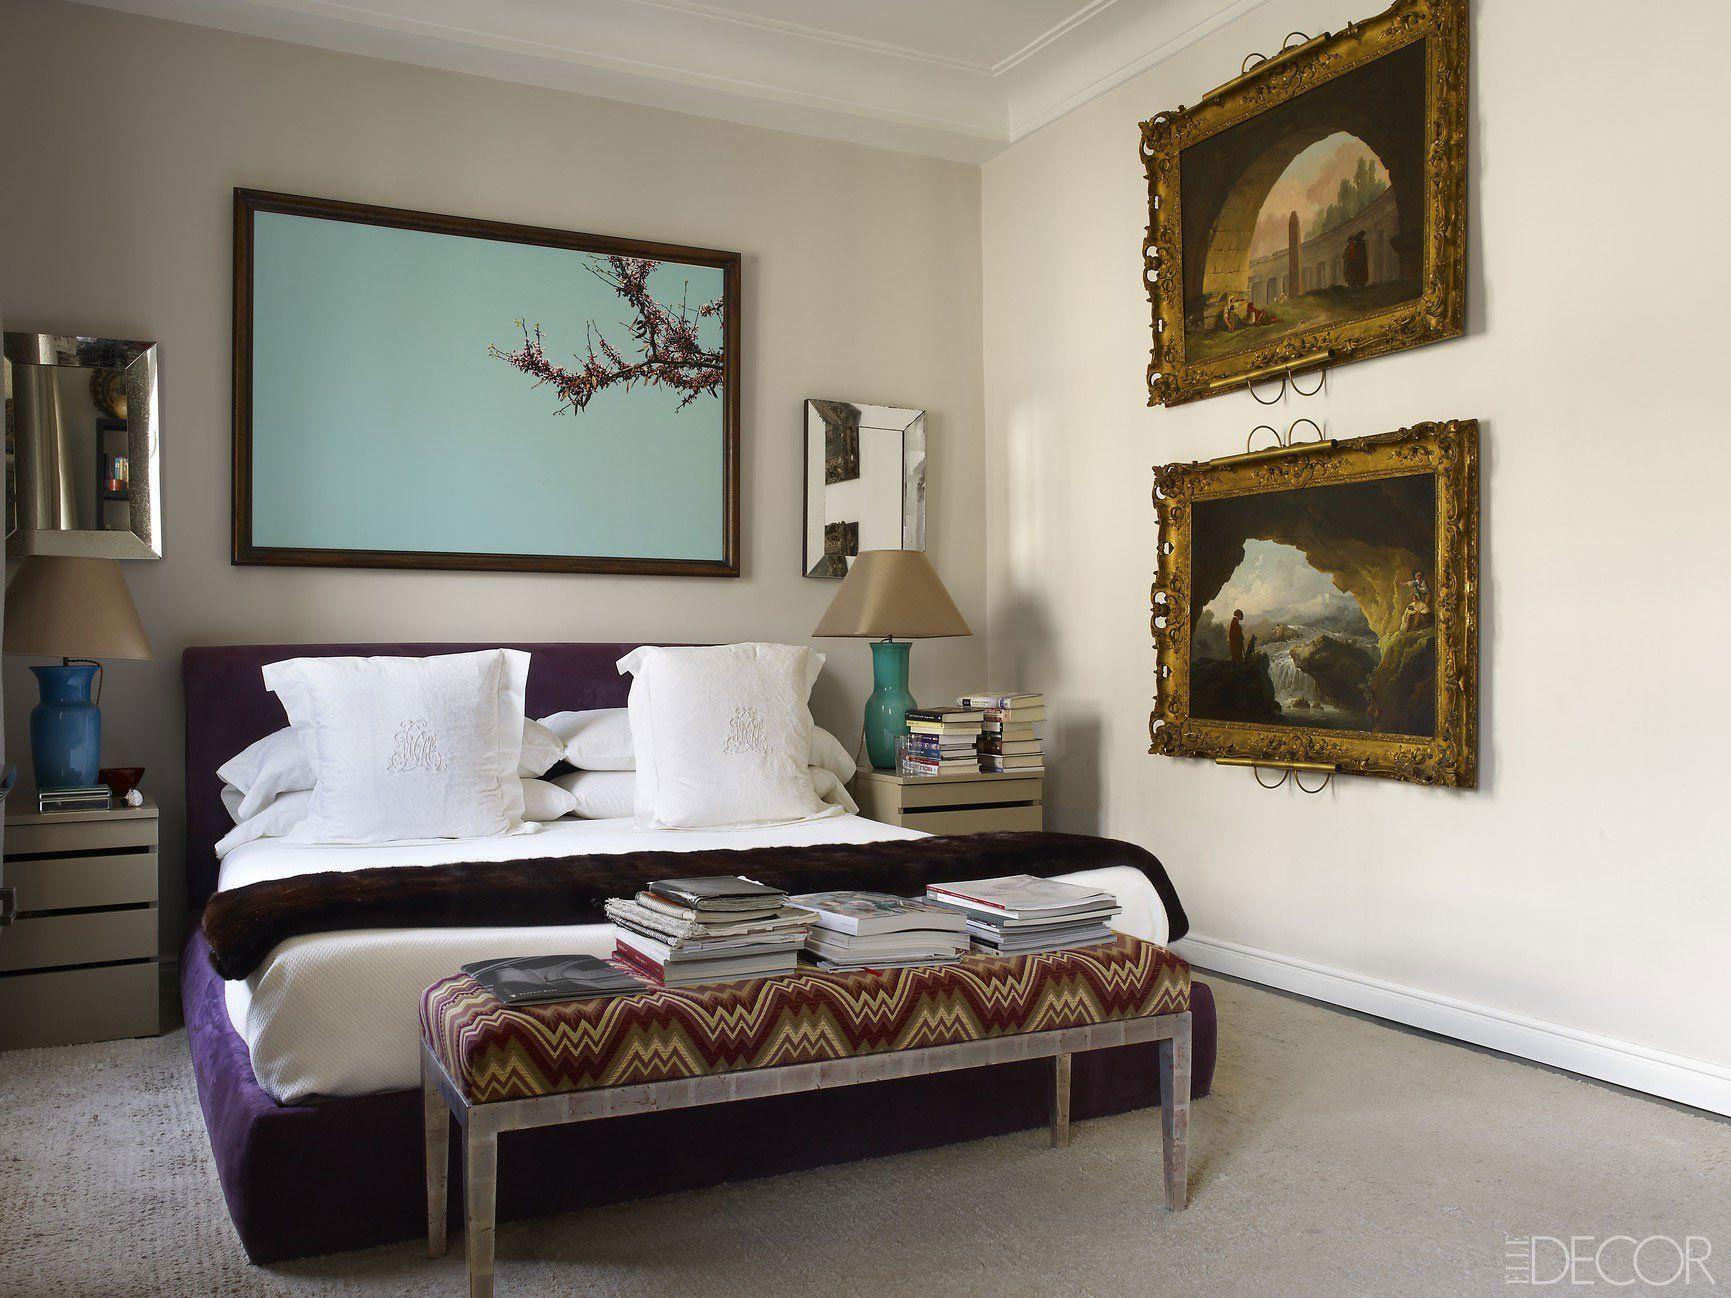 Elle decor master bedroom  manolo march madrid apartment  Bedroom  Pinterest  Madrid